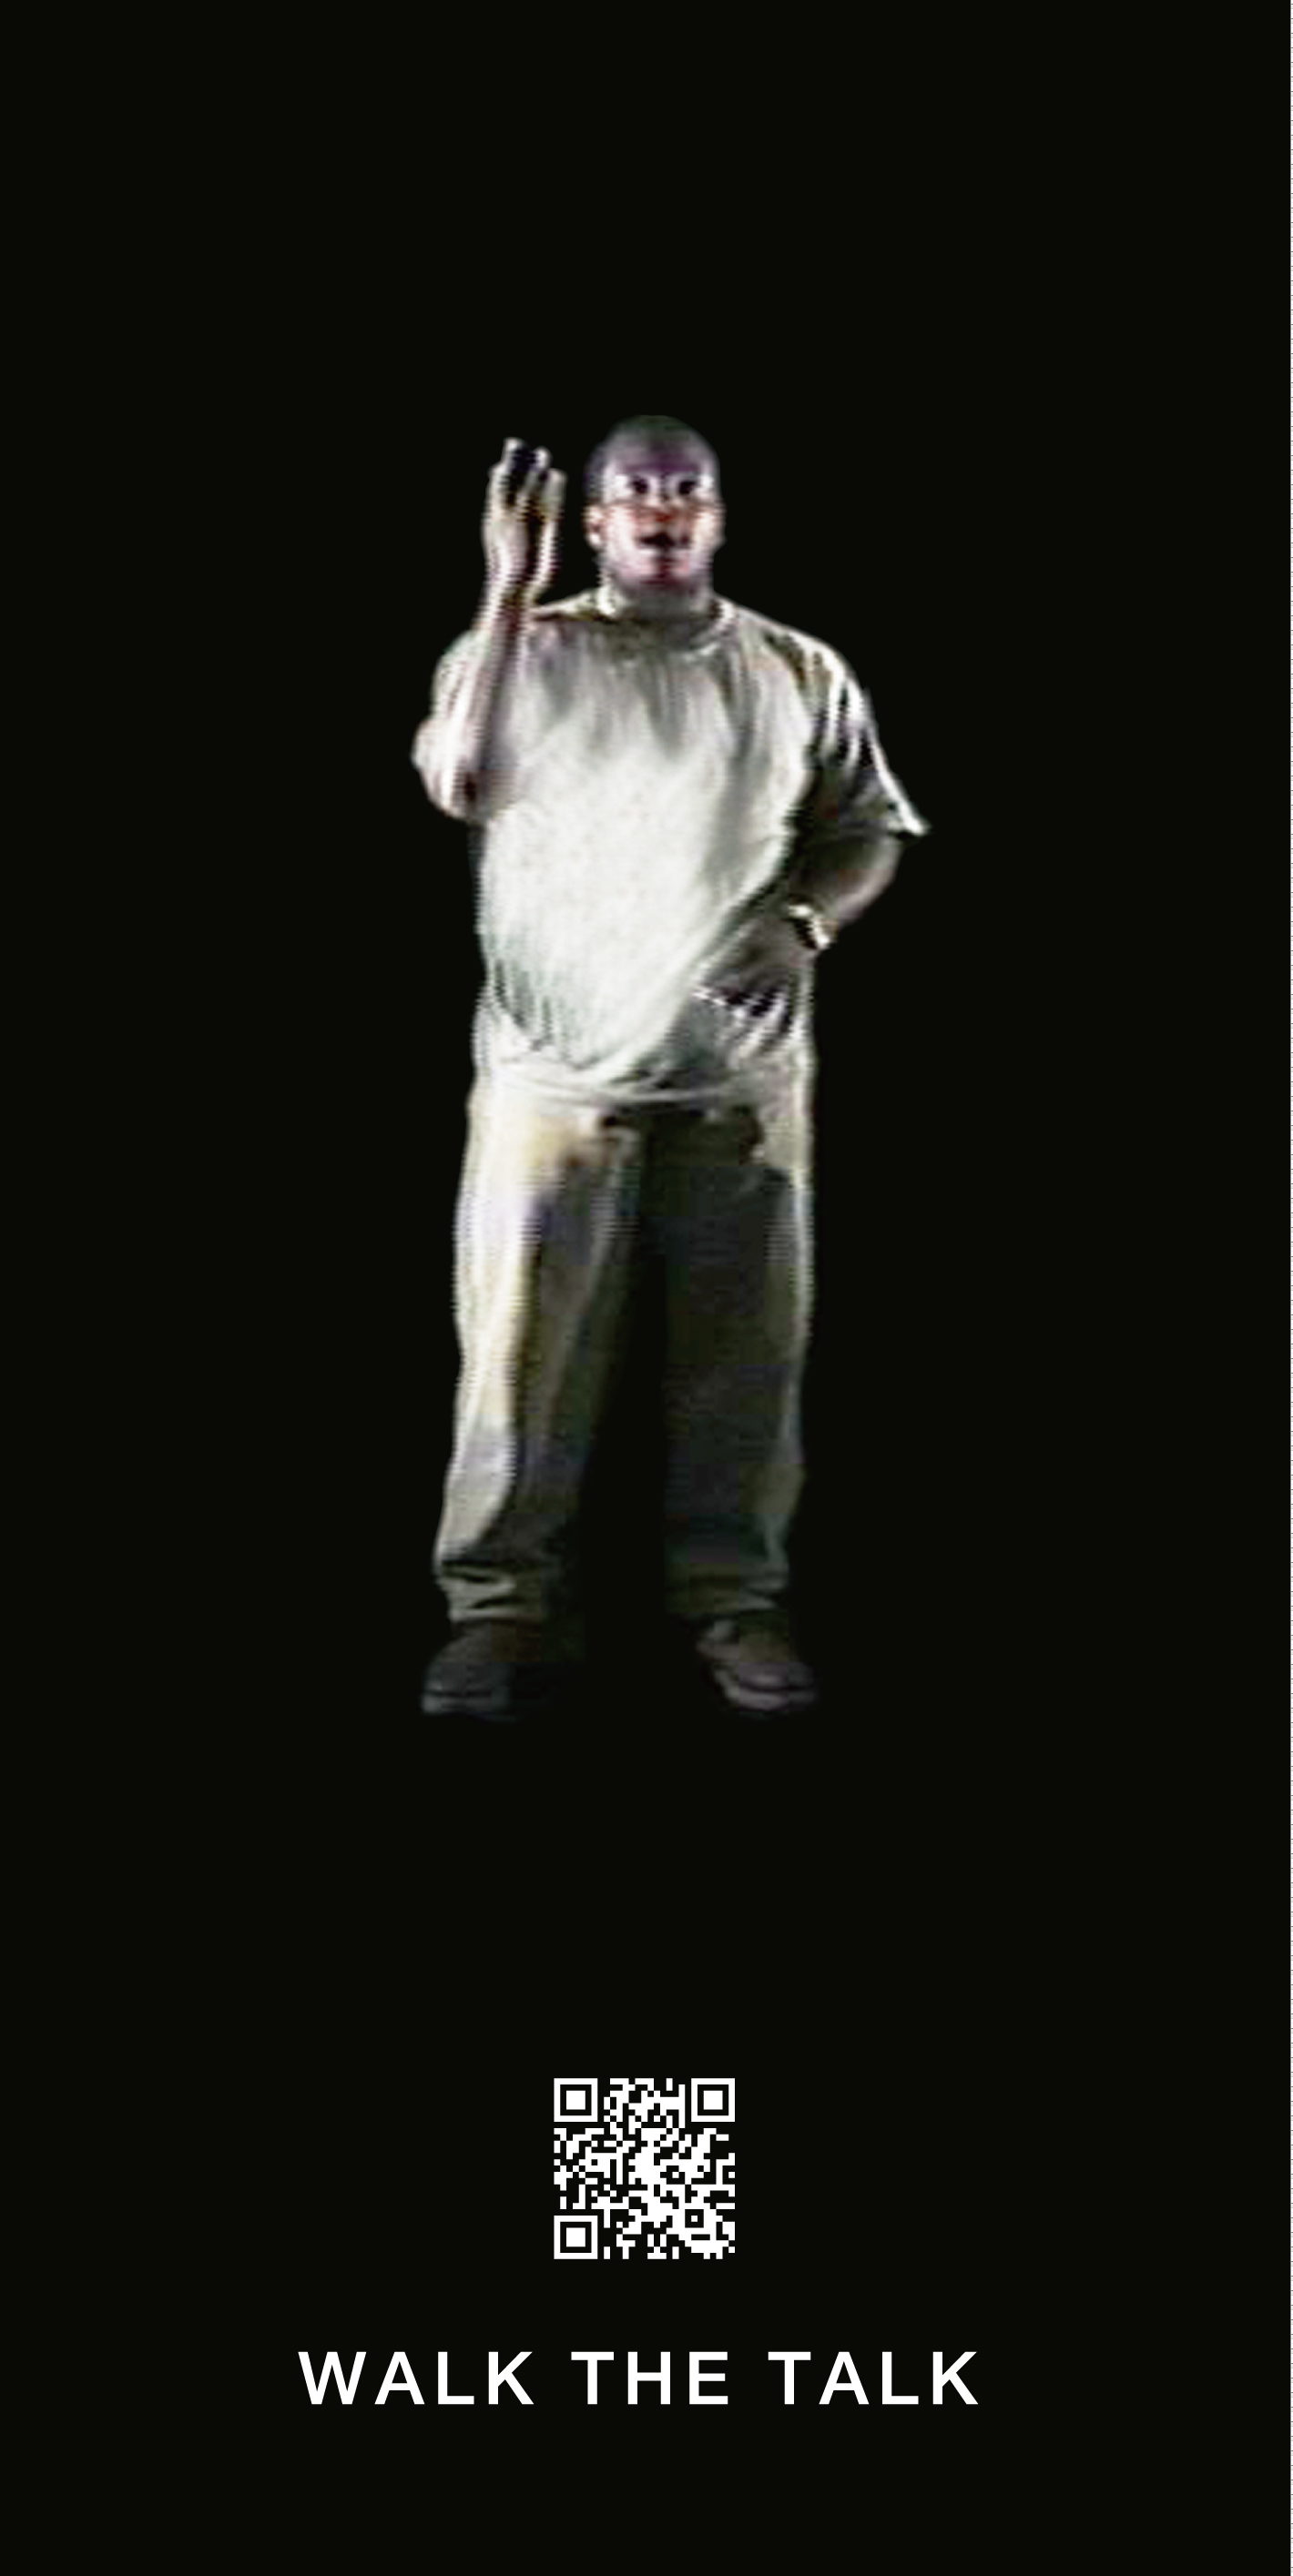 4.21-7.15 金沢アートグミ10周年記念個展 坂野充学 WALK THE TALK